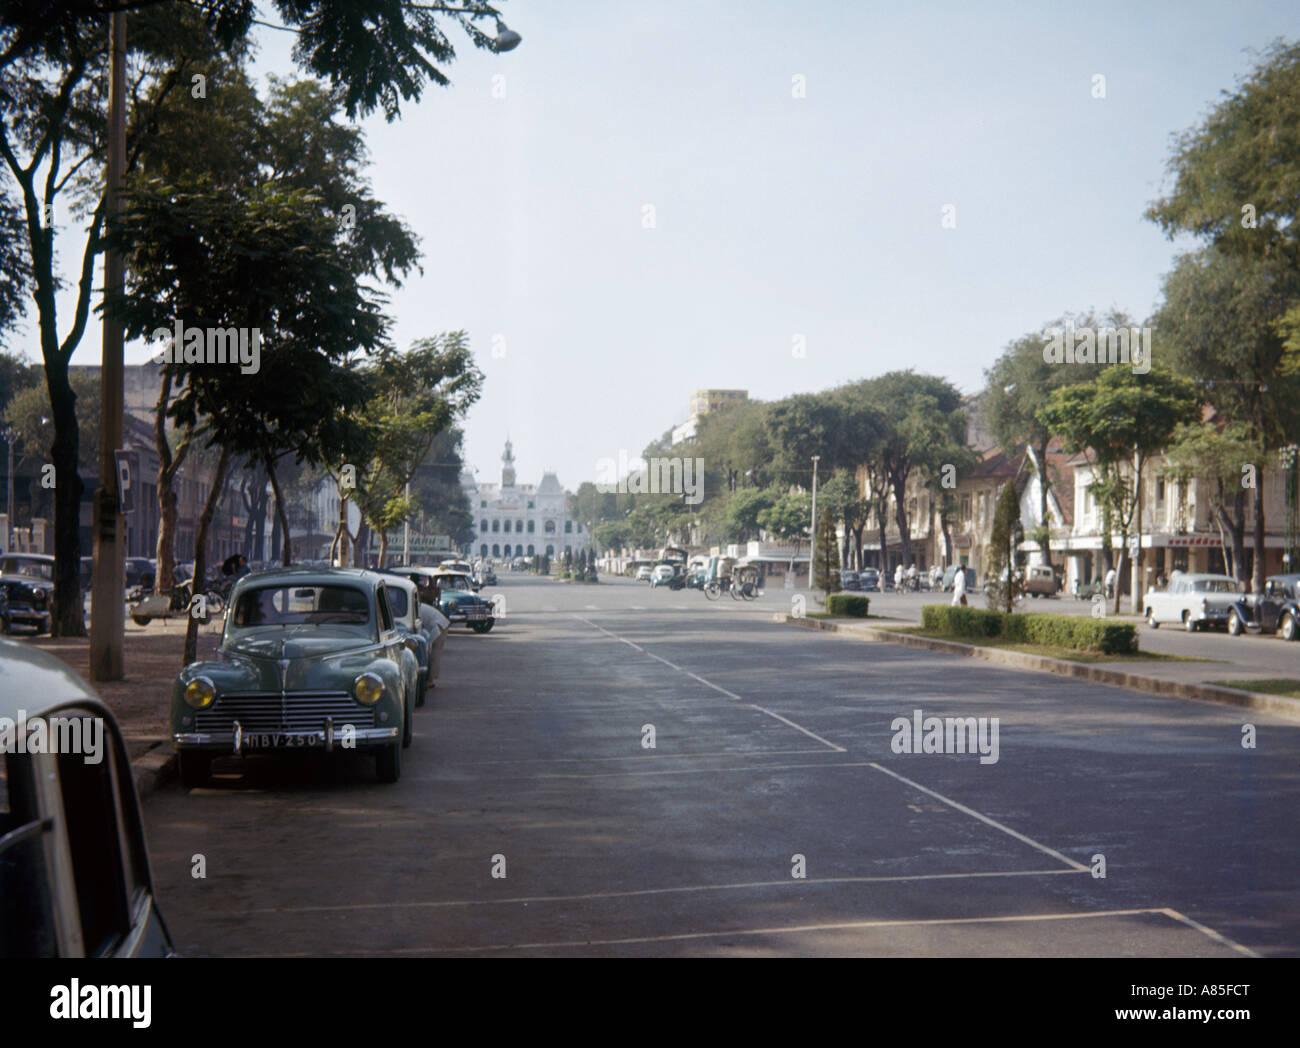 Avenue in City Centre in 1960, Saigon, Vietnam - Stock Image